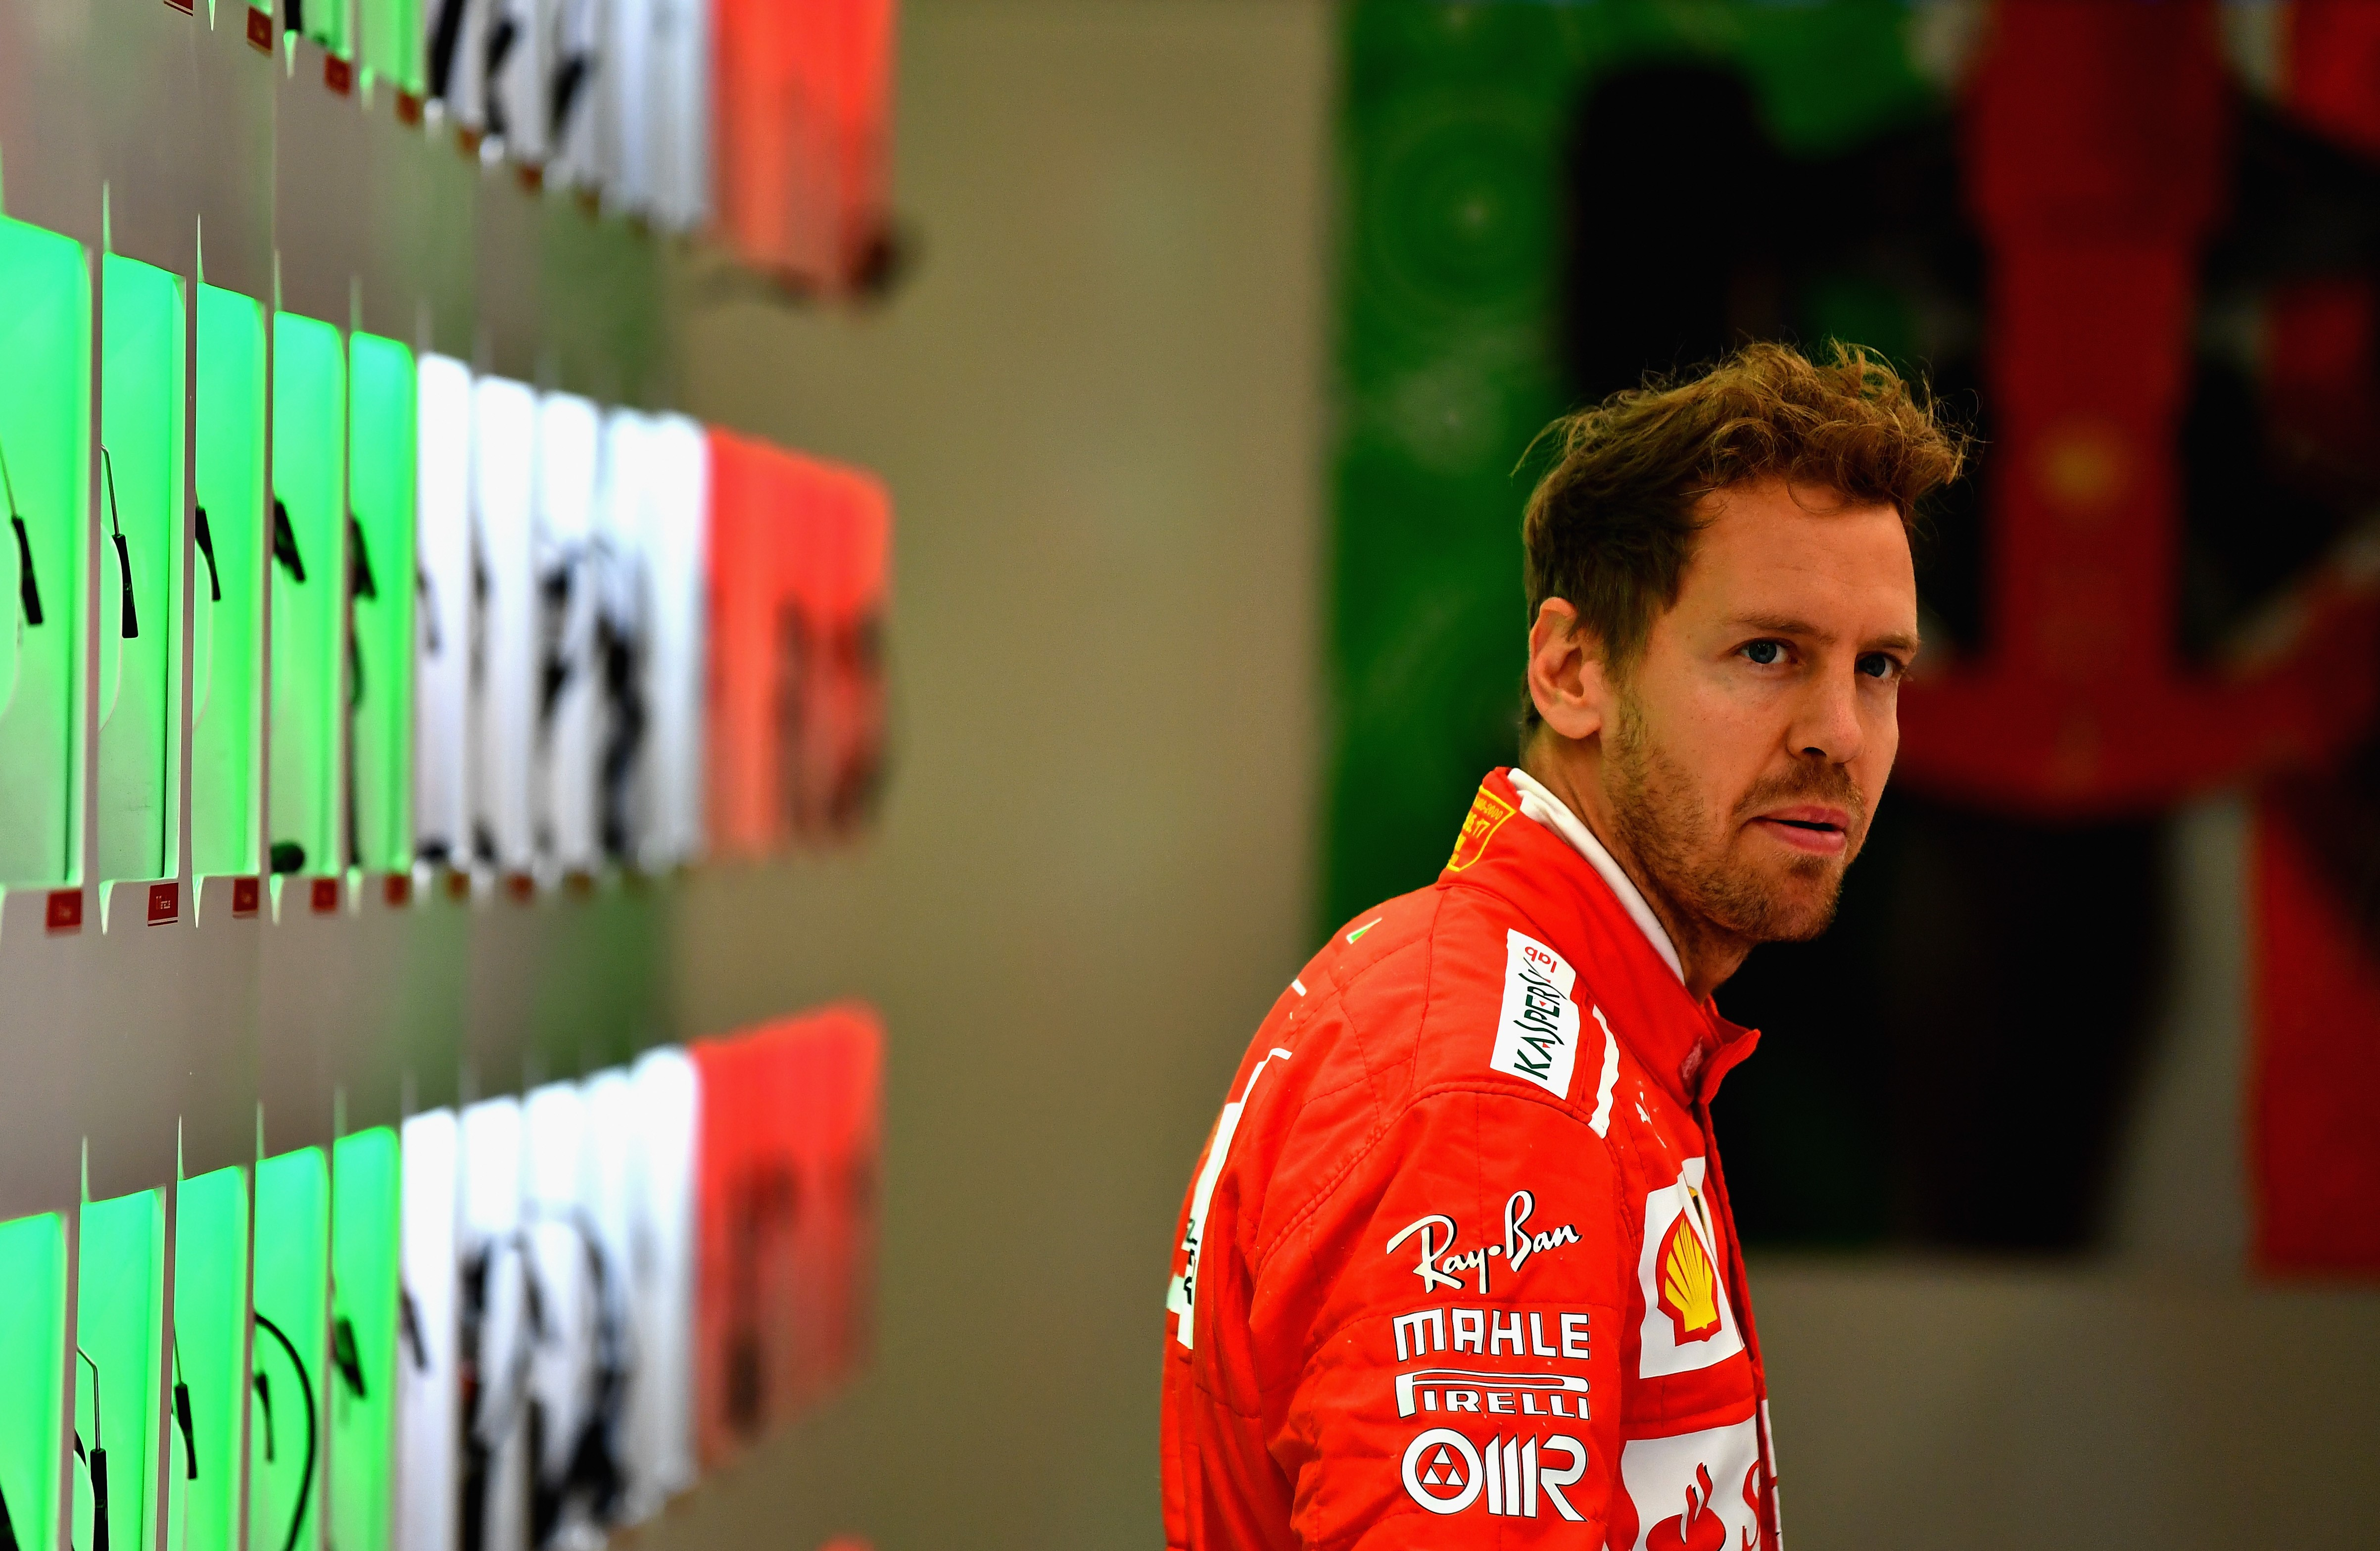 Sebastian Vettel (Ferrari) au Grand Prix de Grande-Bretagne 2017